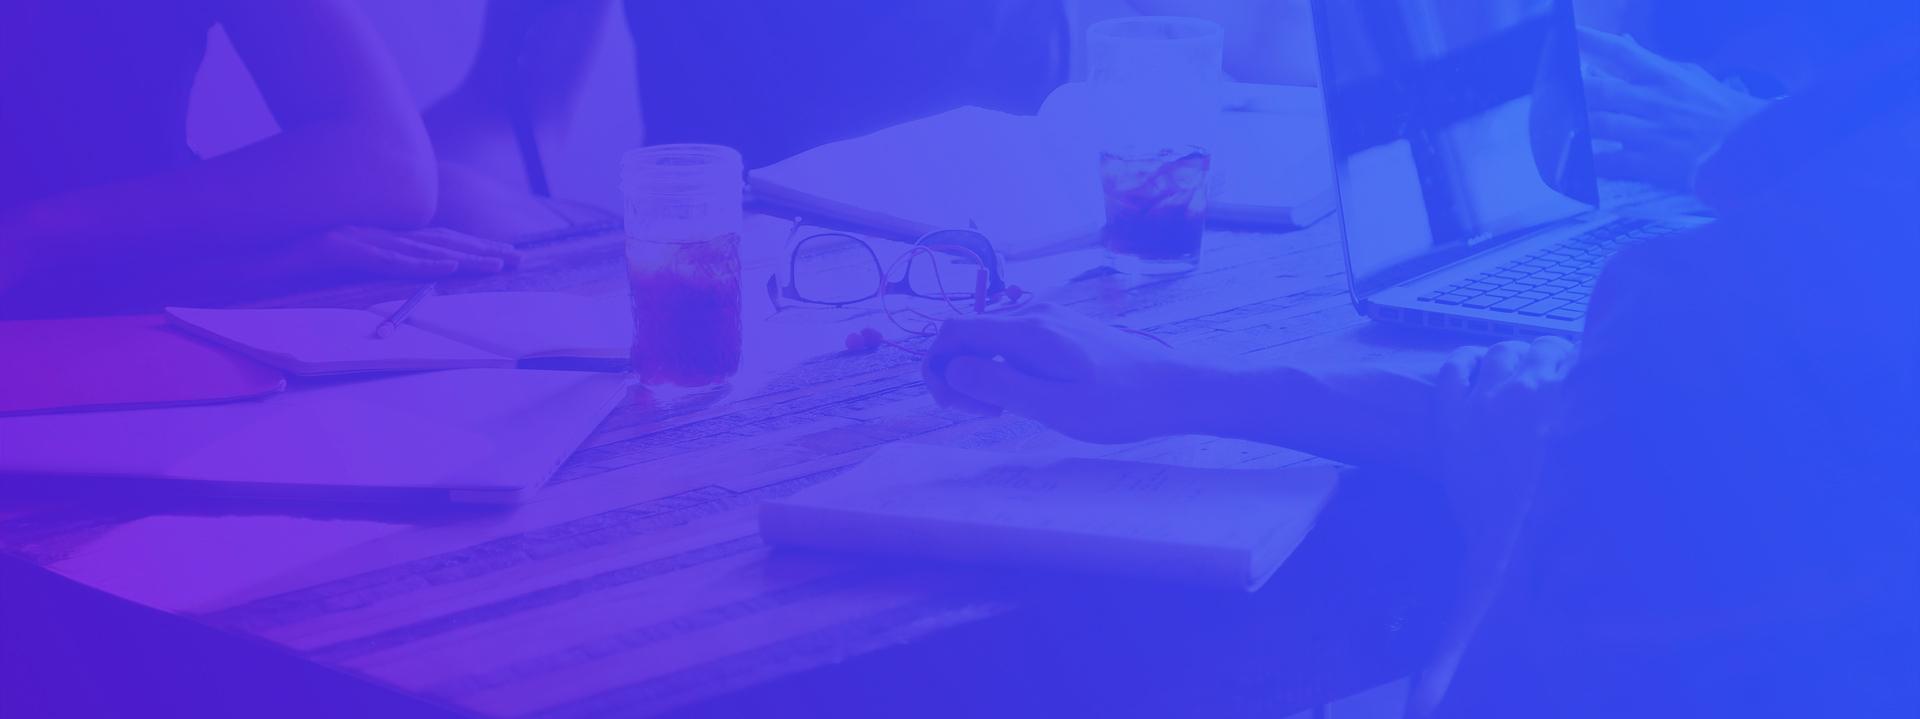 sharepoint-document-management-system-webinar-background.png